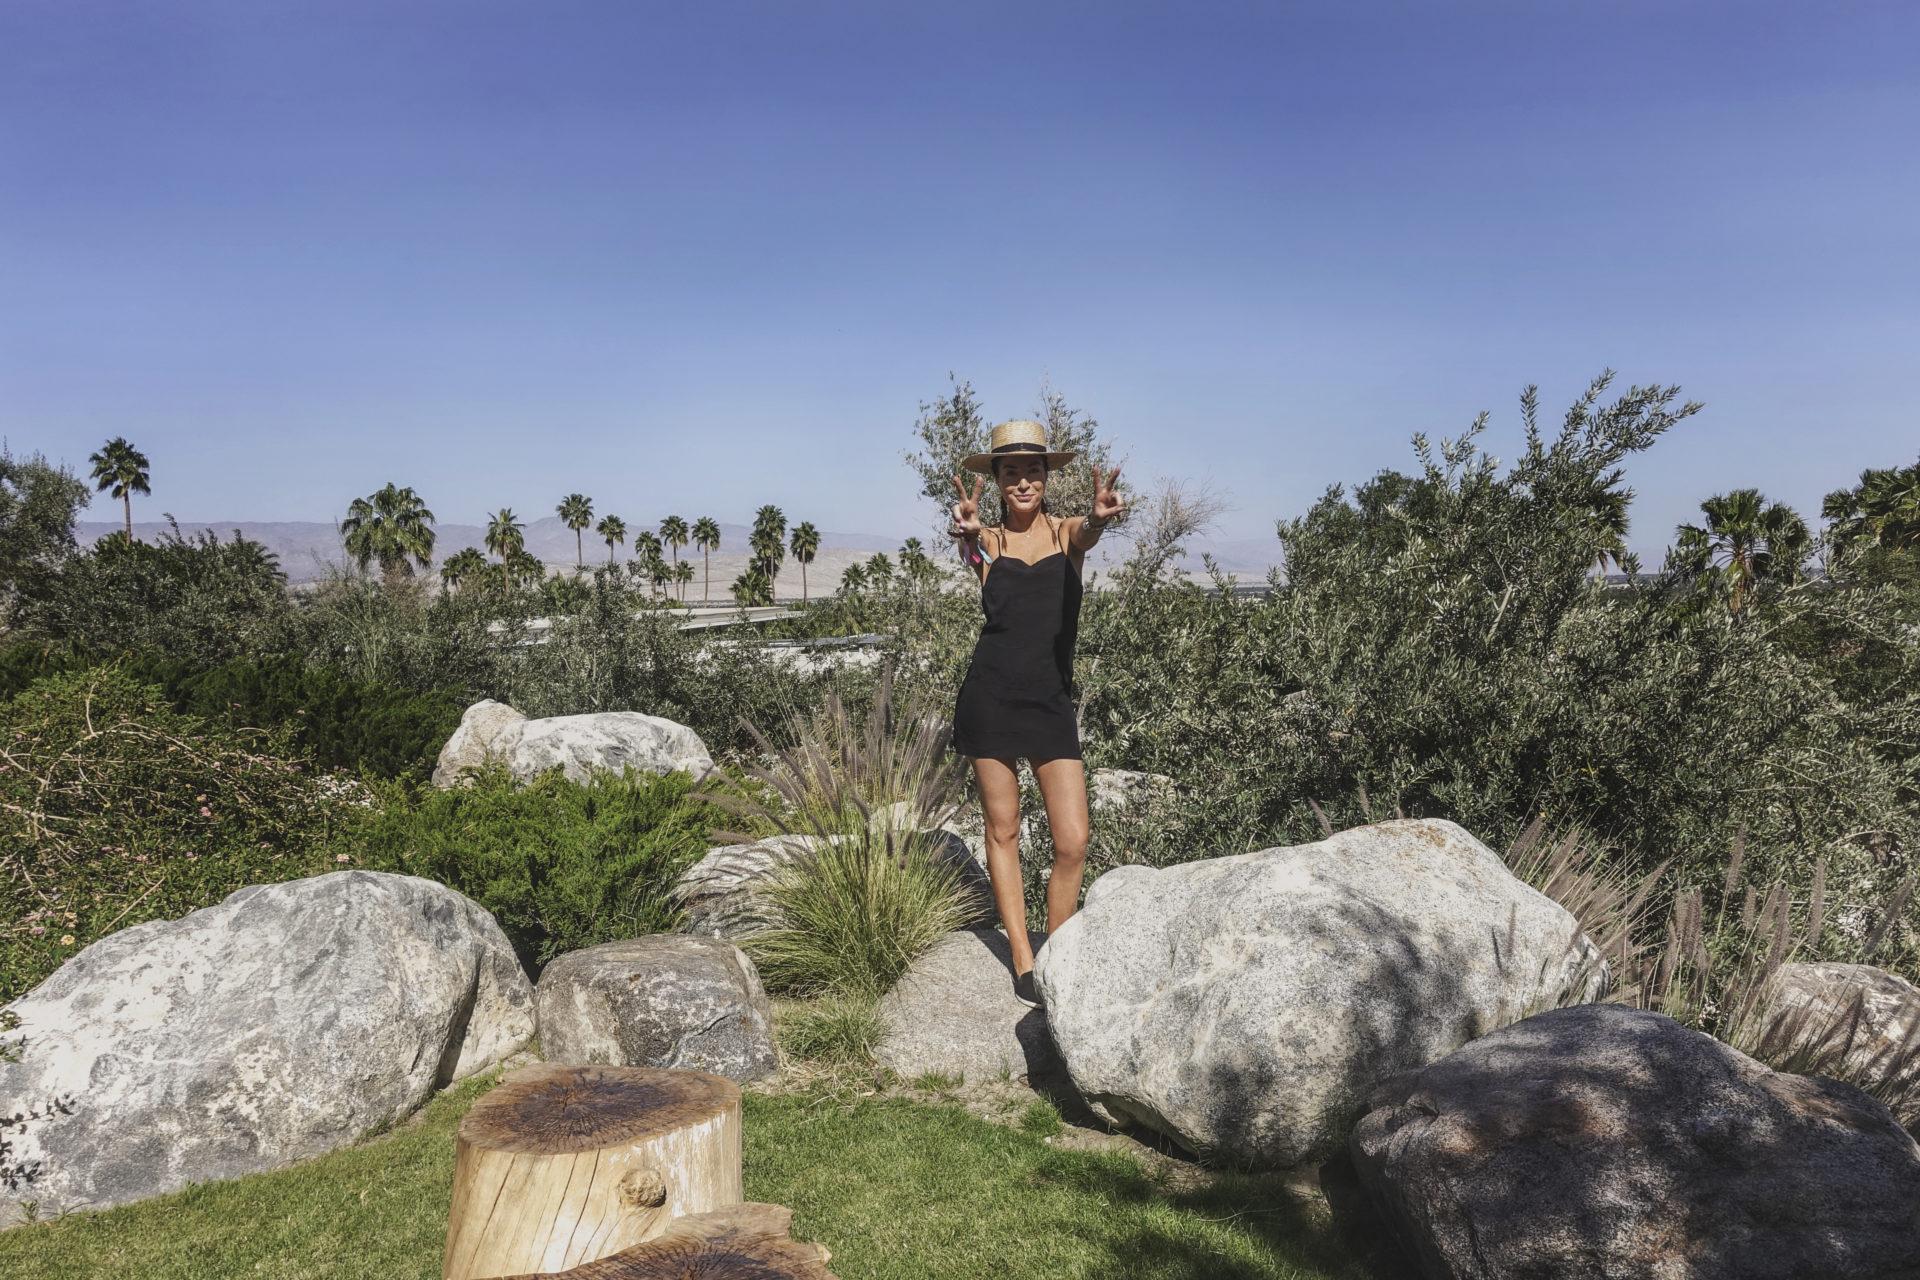 Palm Desert pre-game in a little black dress at Coachella